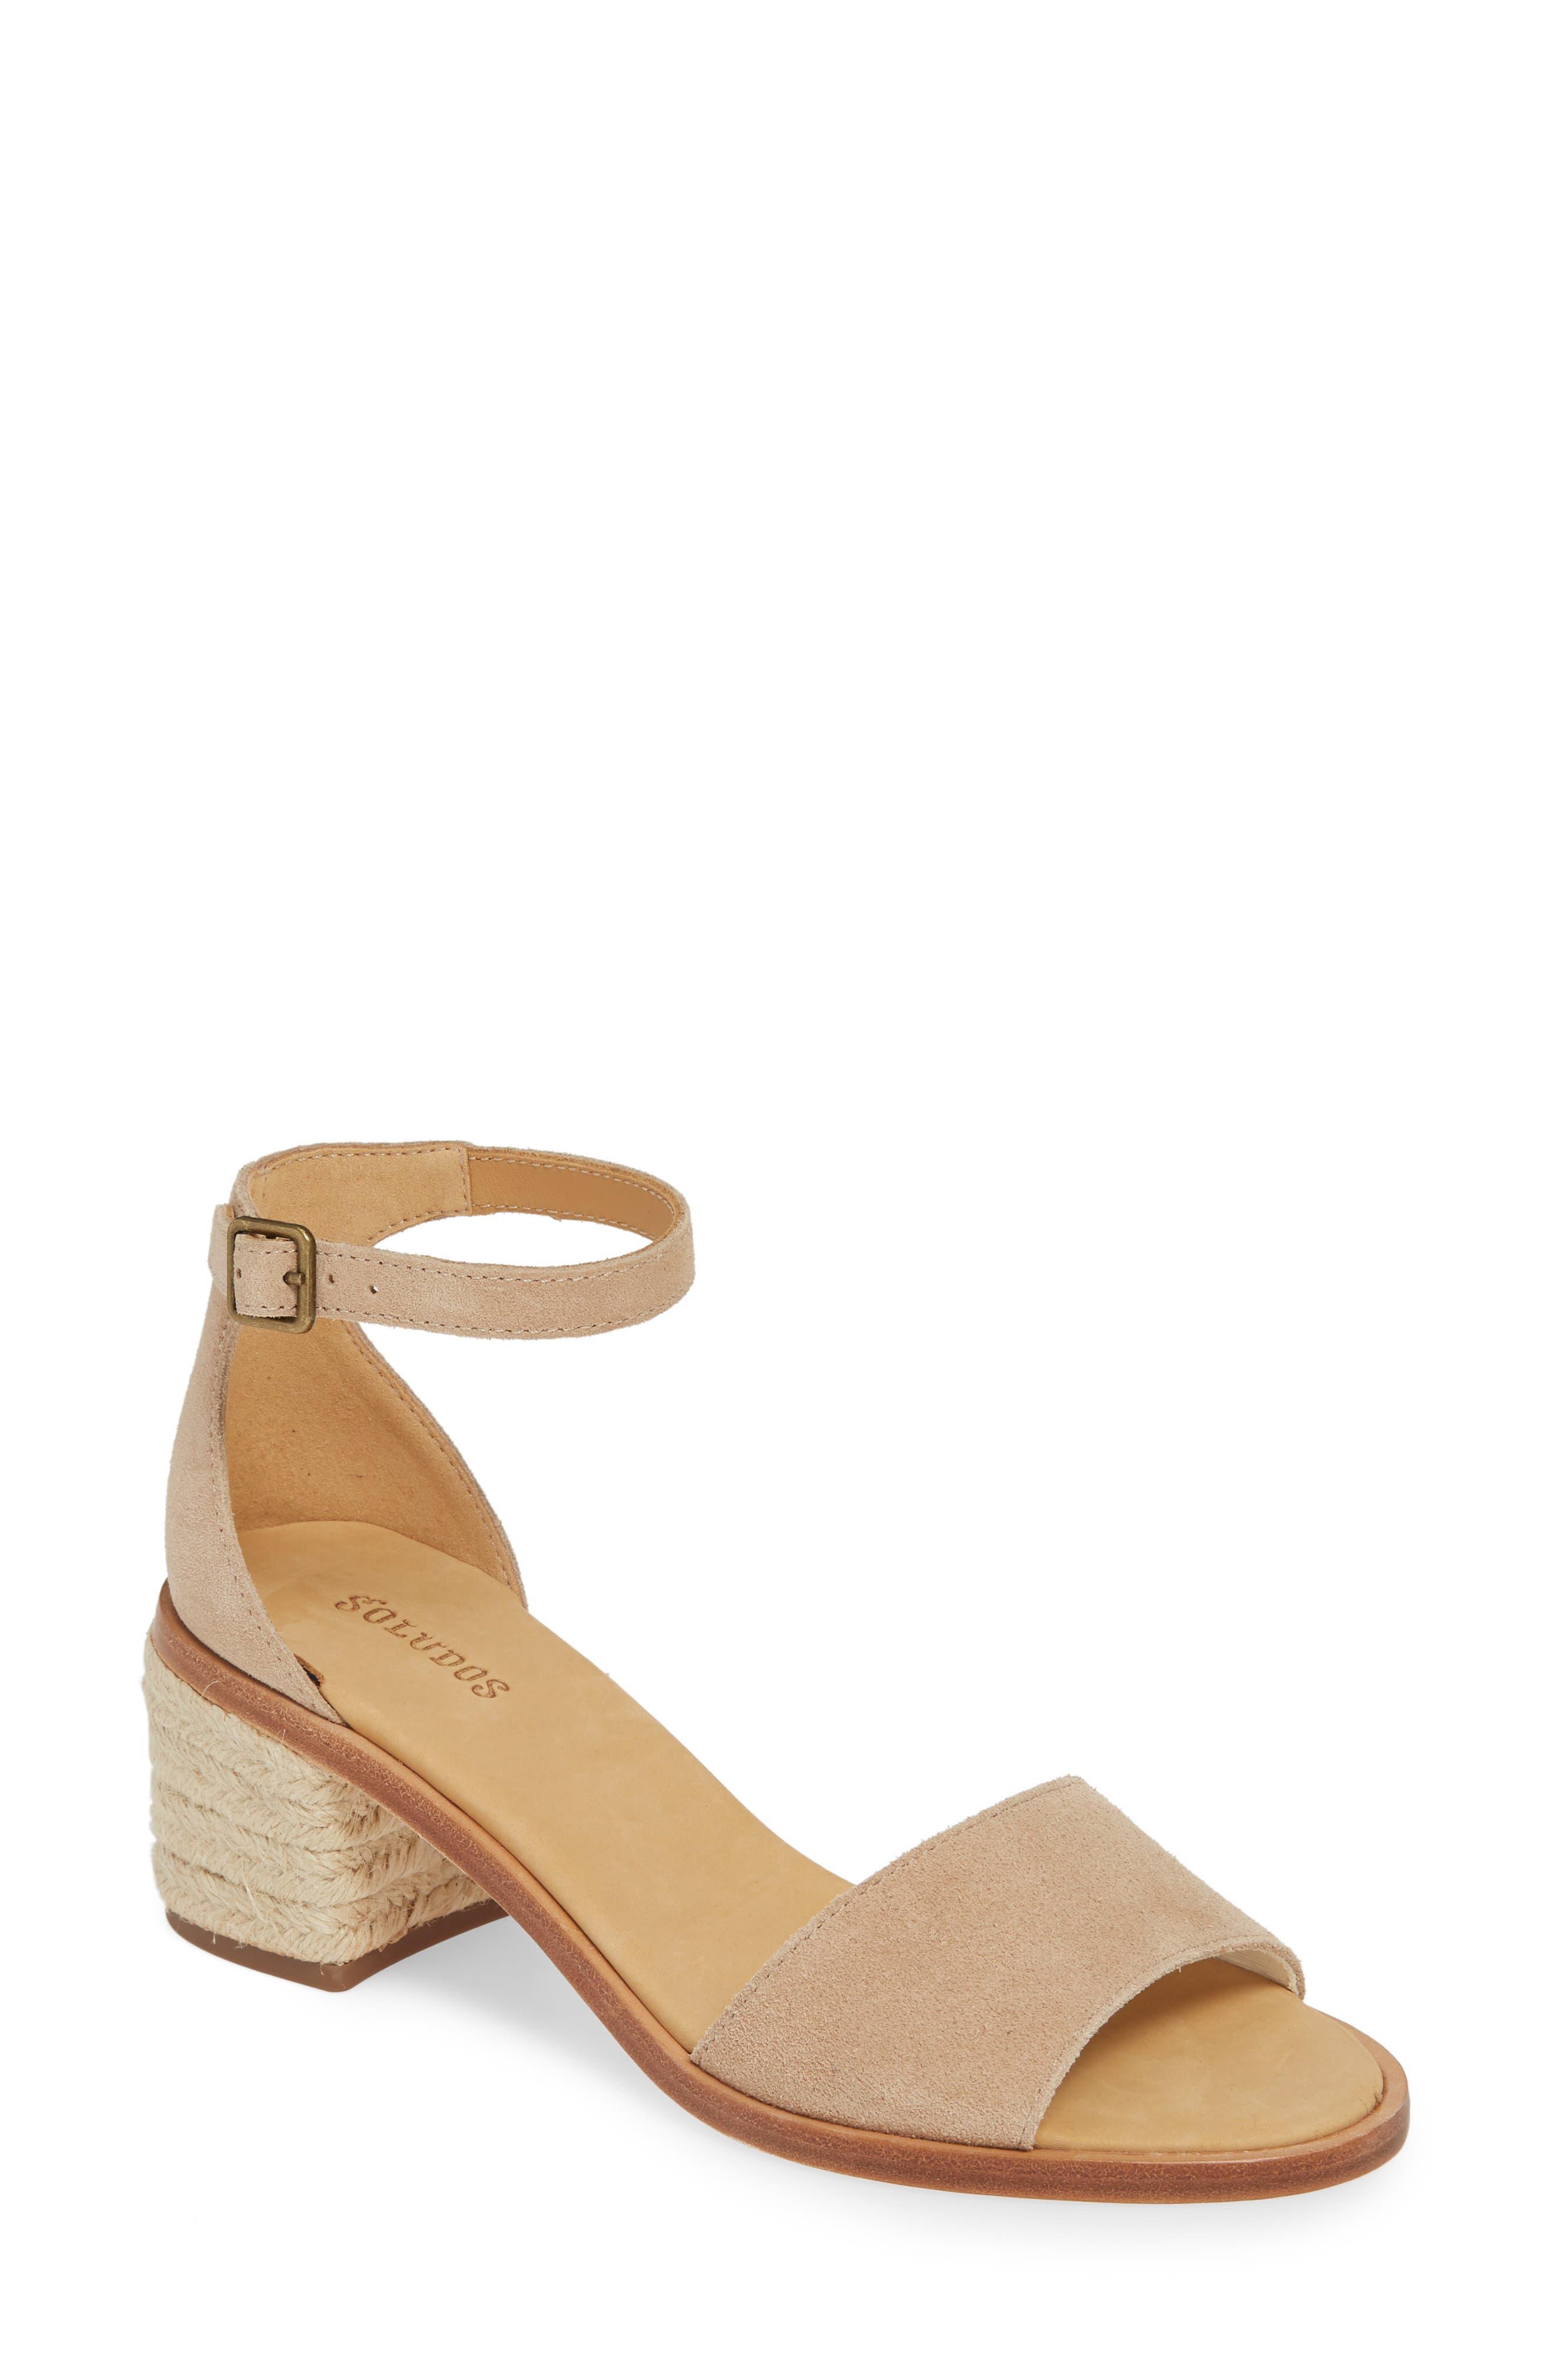 Soludos Capri Espadrille Heel Sandal, Pink